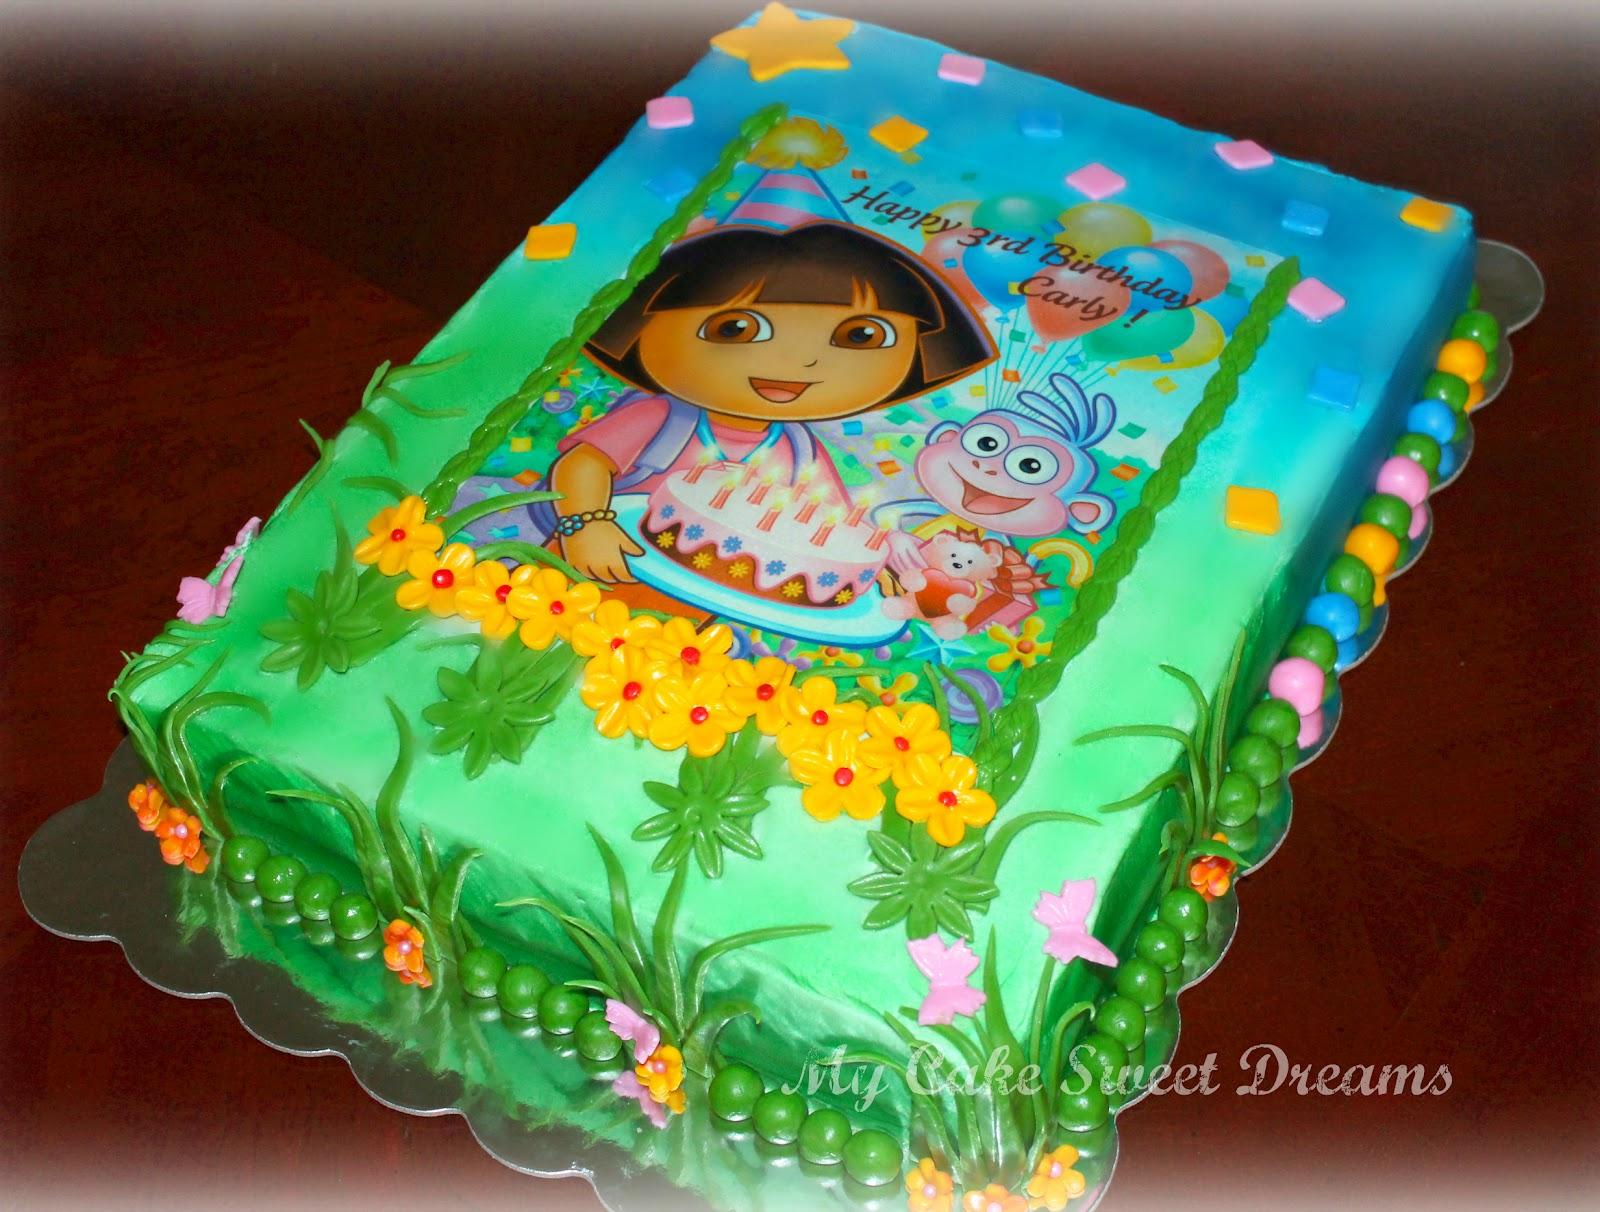 My Cake Sweet Dreams: Dora Birthday Cake intérieur Gateau Dora